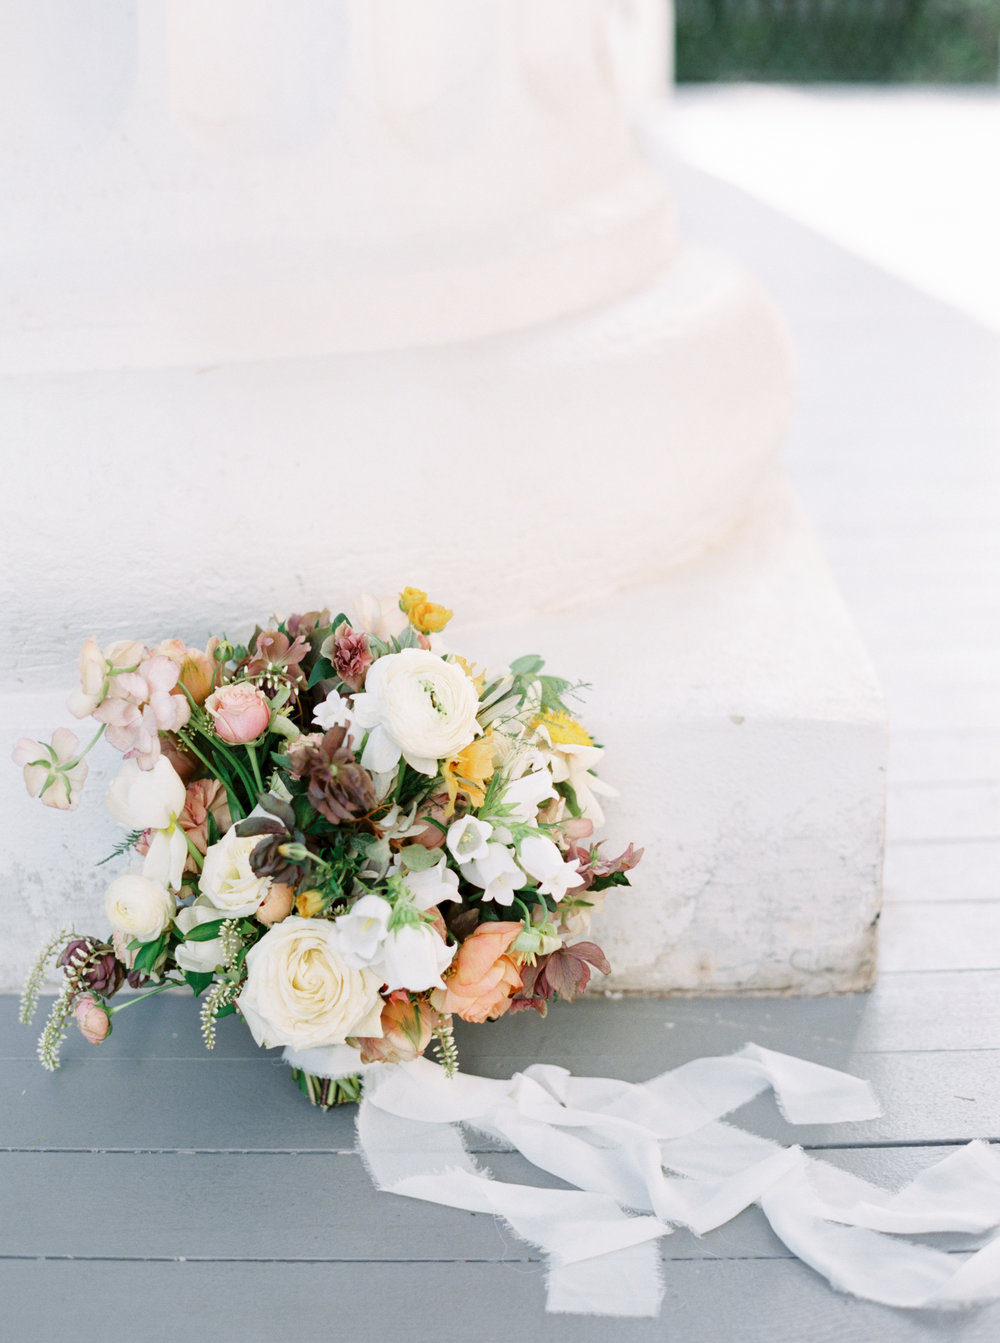 Pretty Bridal Bouquet inspo with flowy white silk ribbons